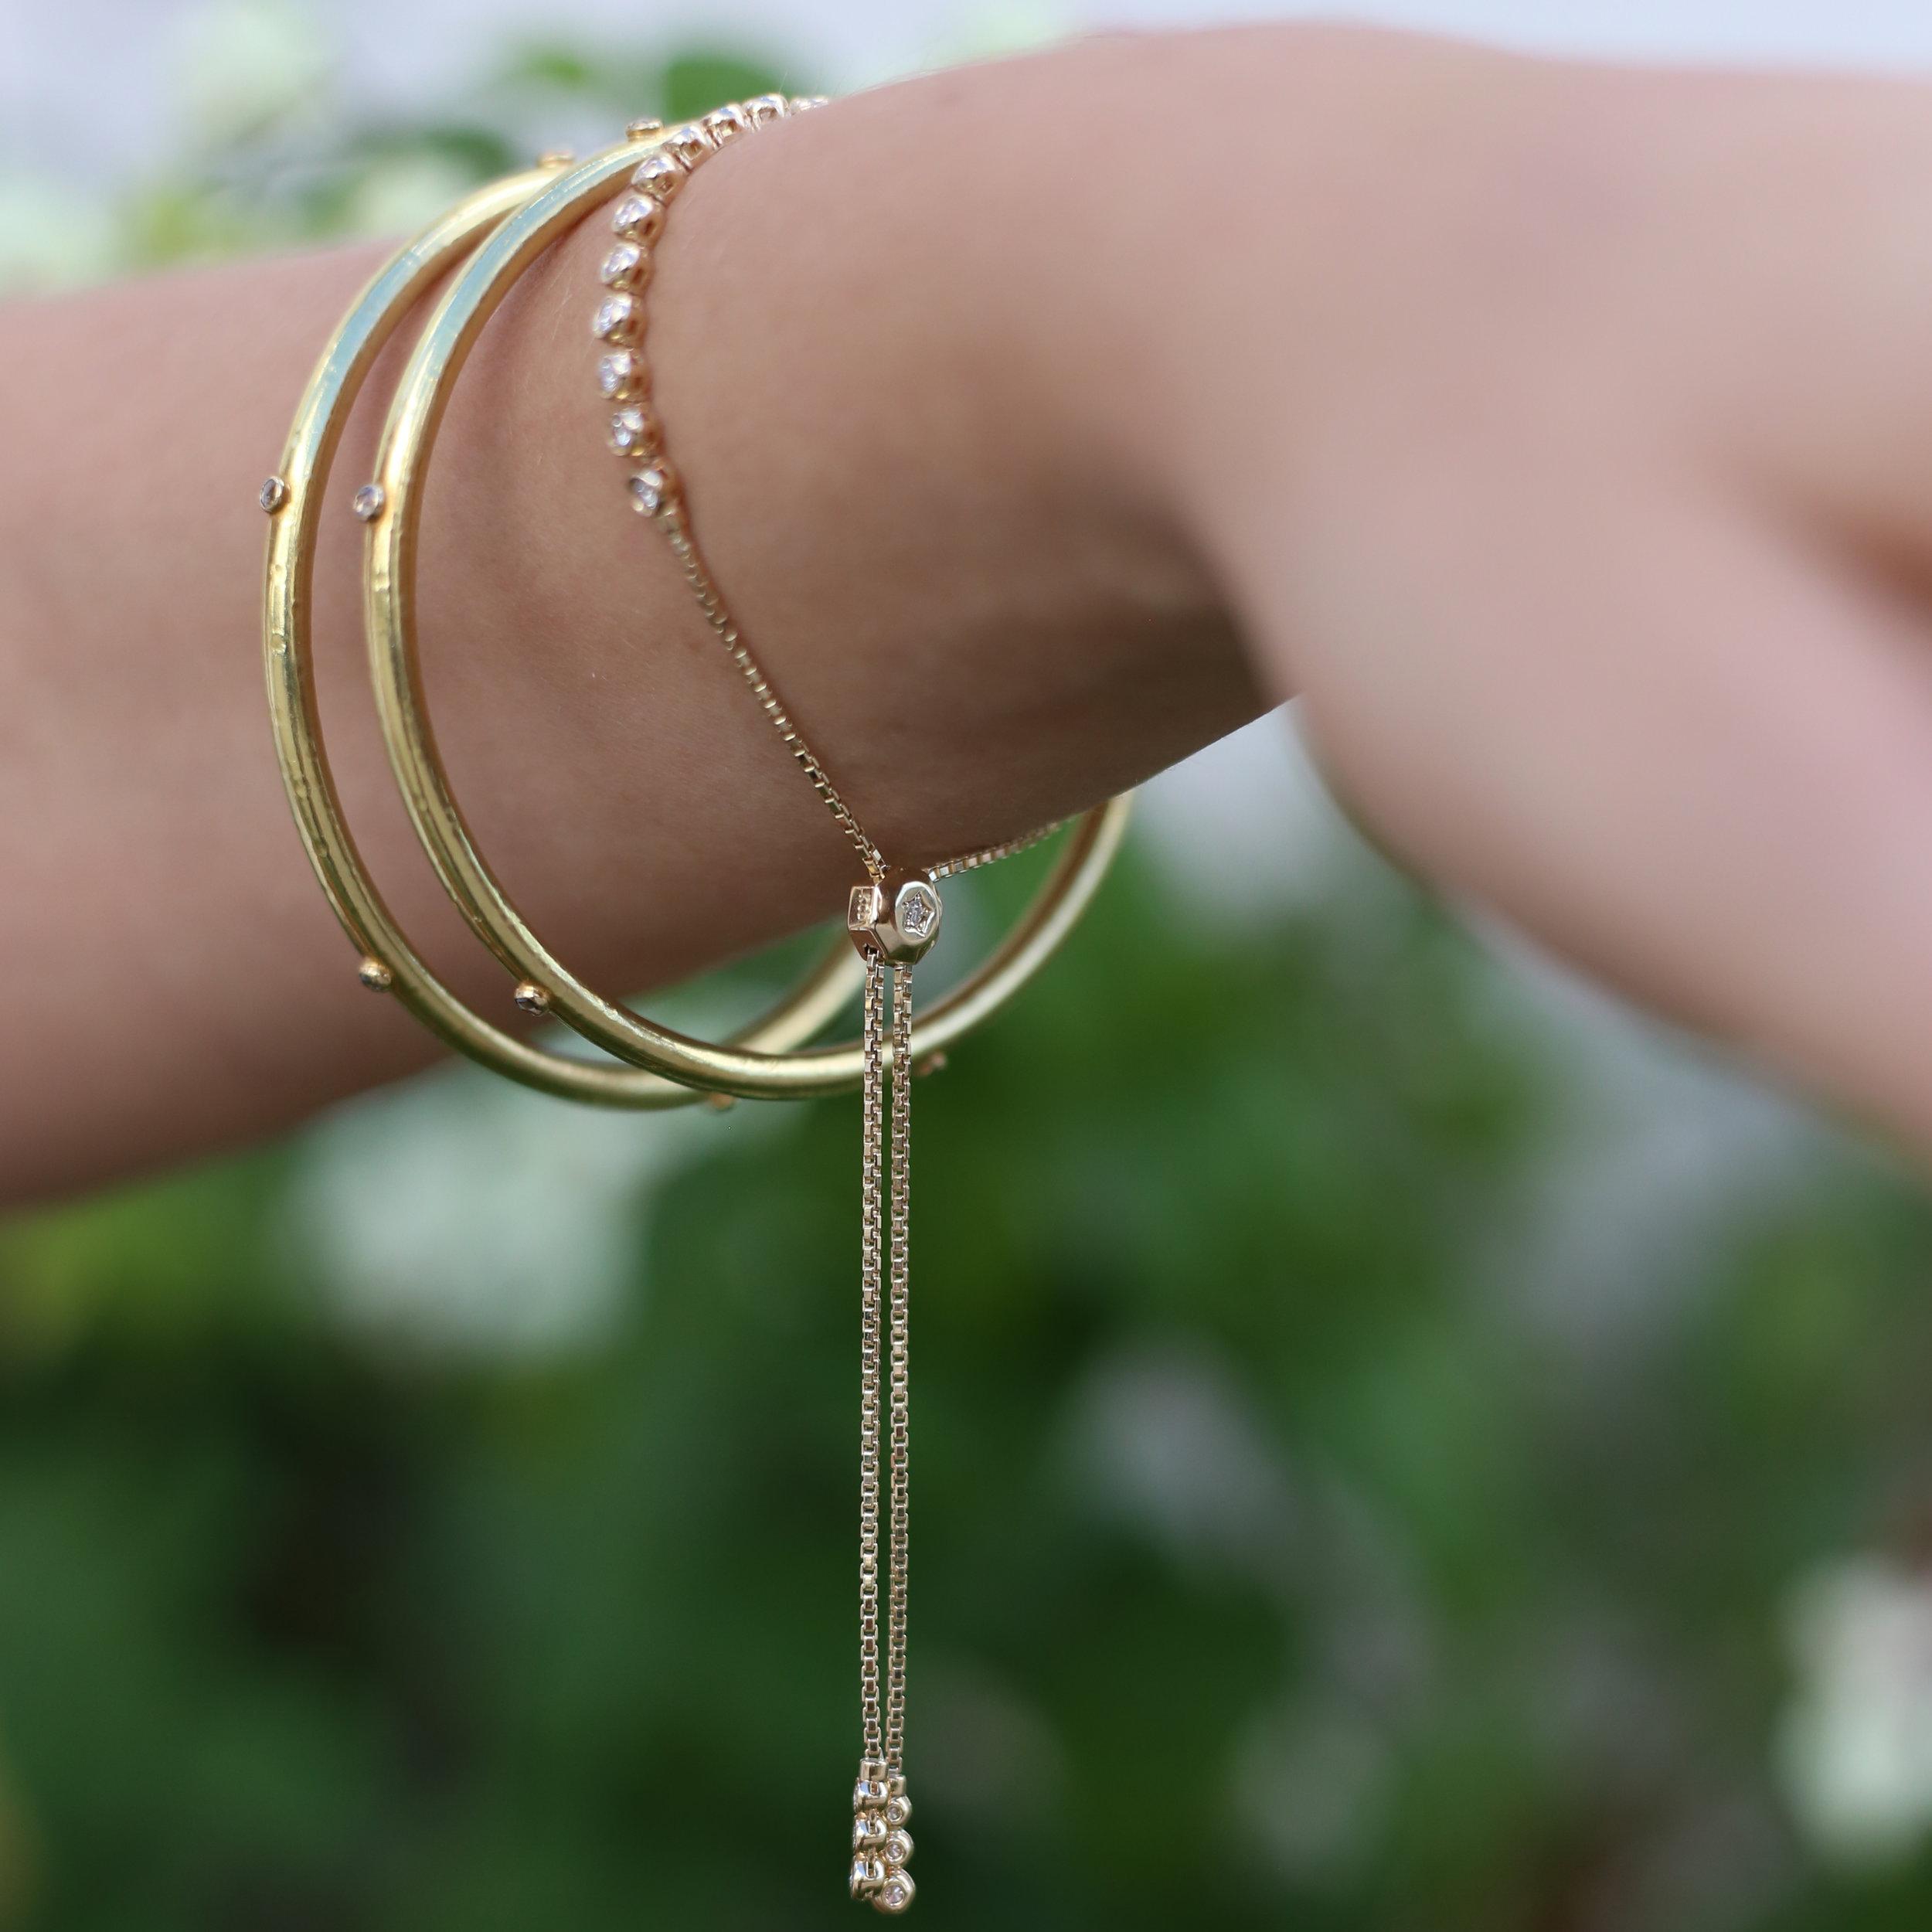 diamond_adjustable_bolo_bracelet_gold.jpg